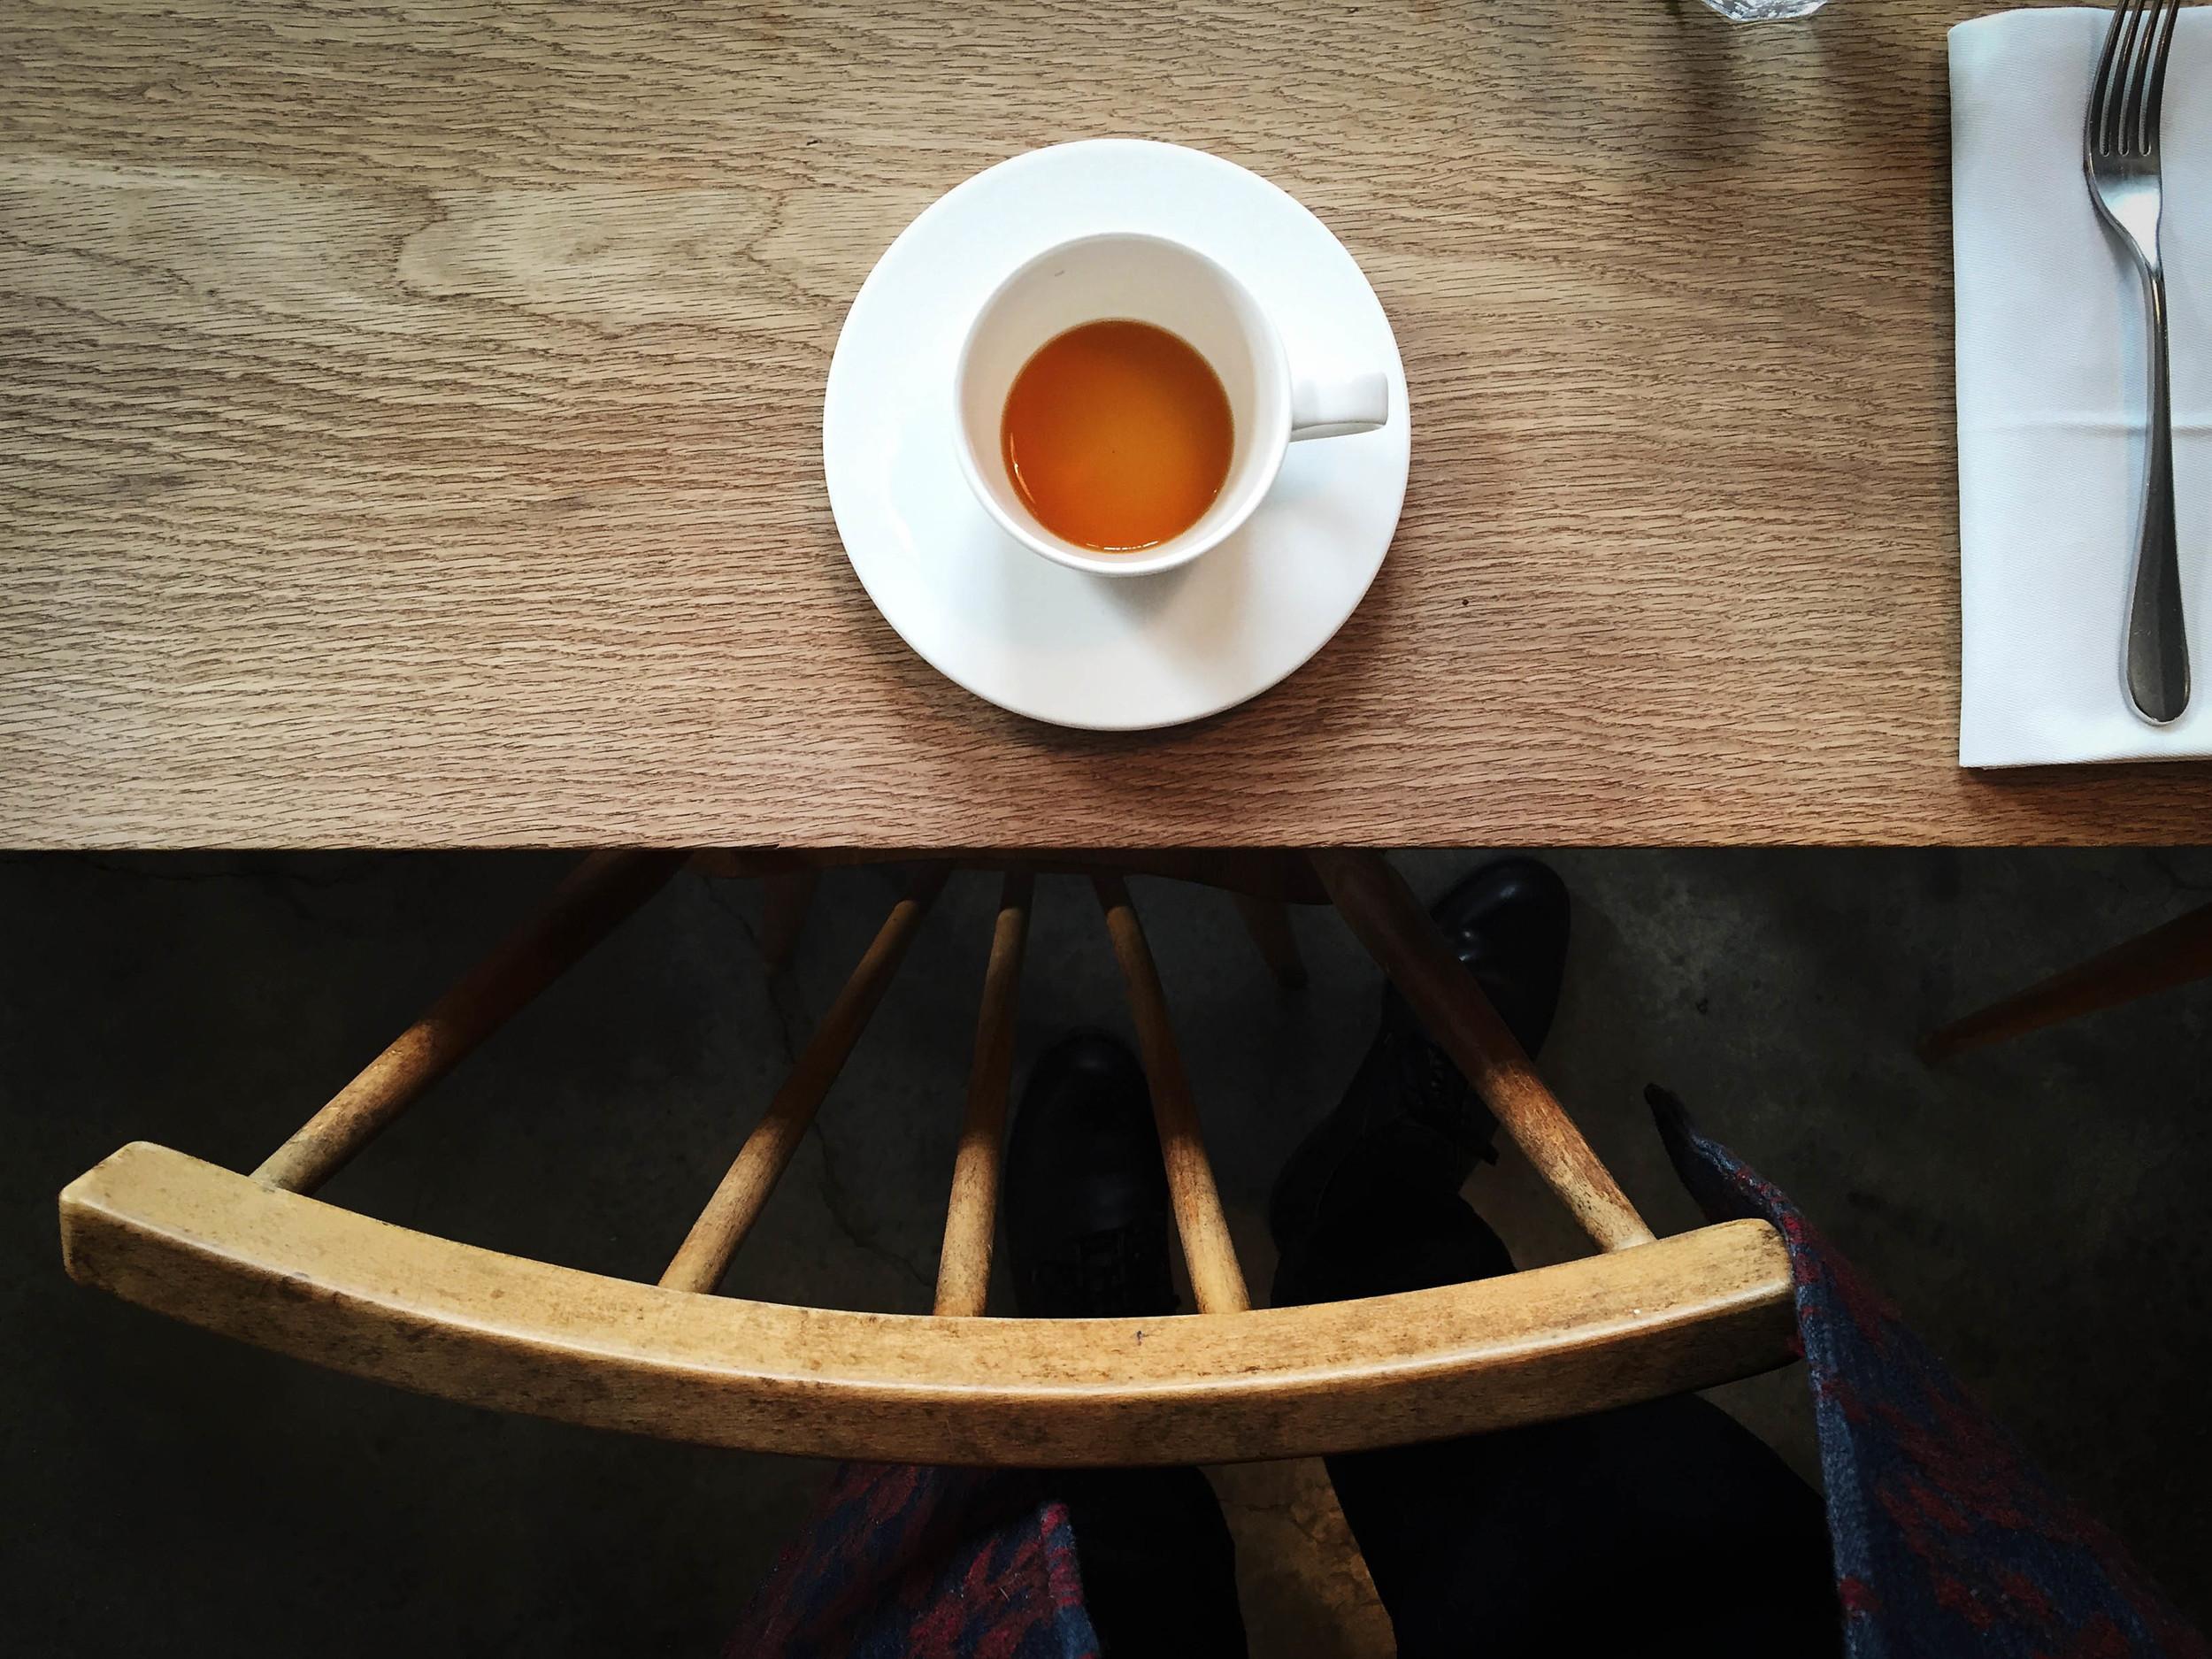 Coffee in restaurants